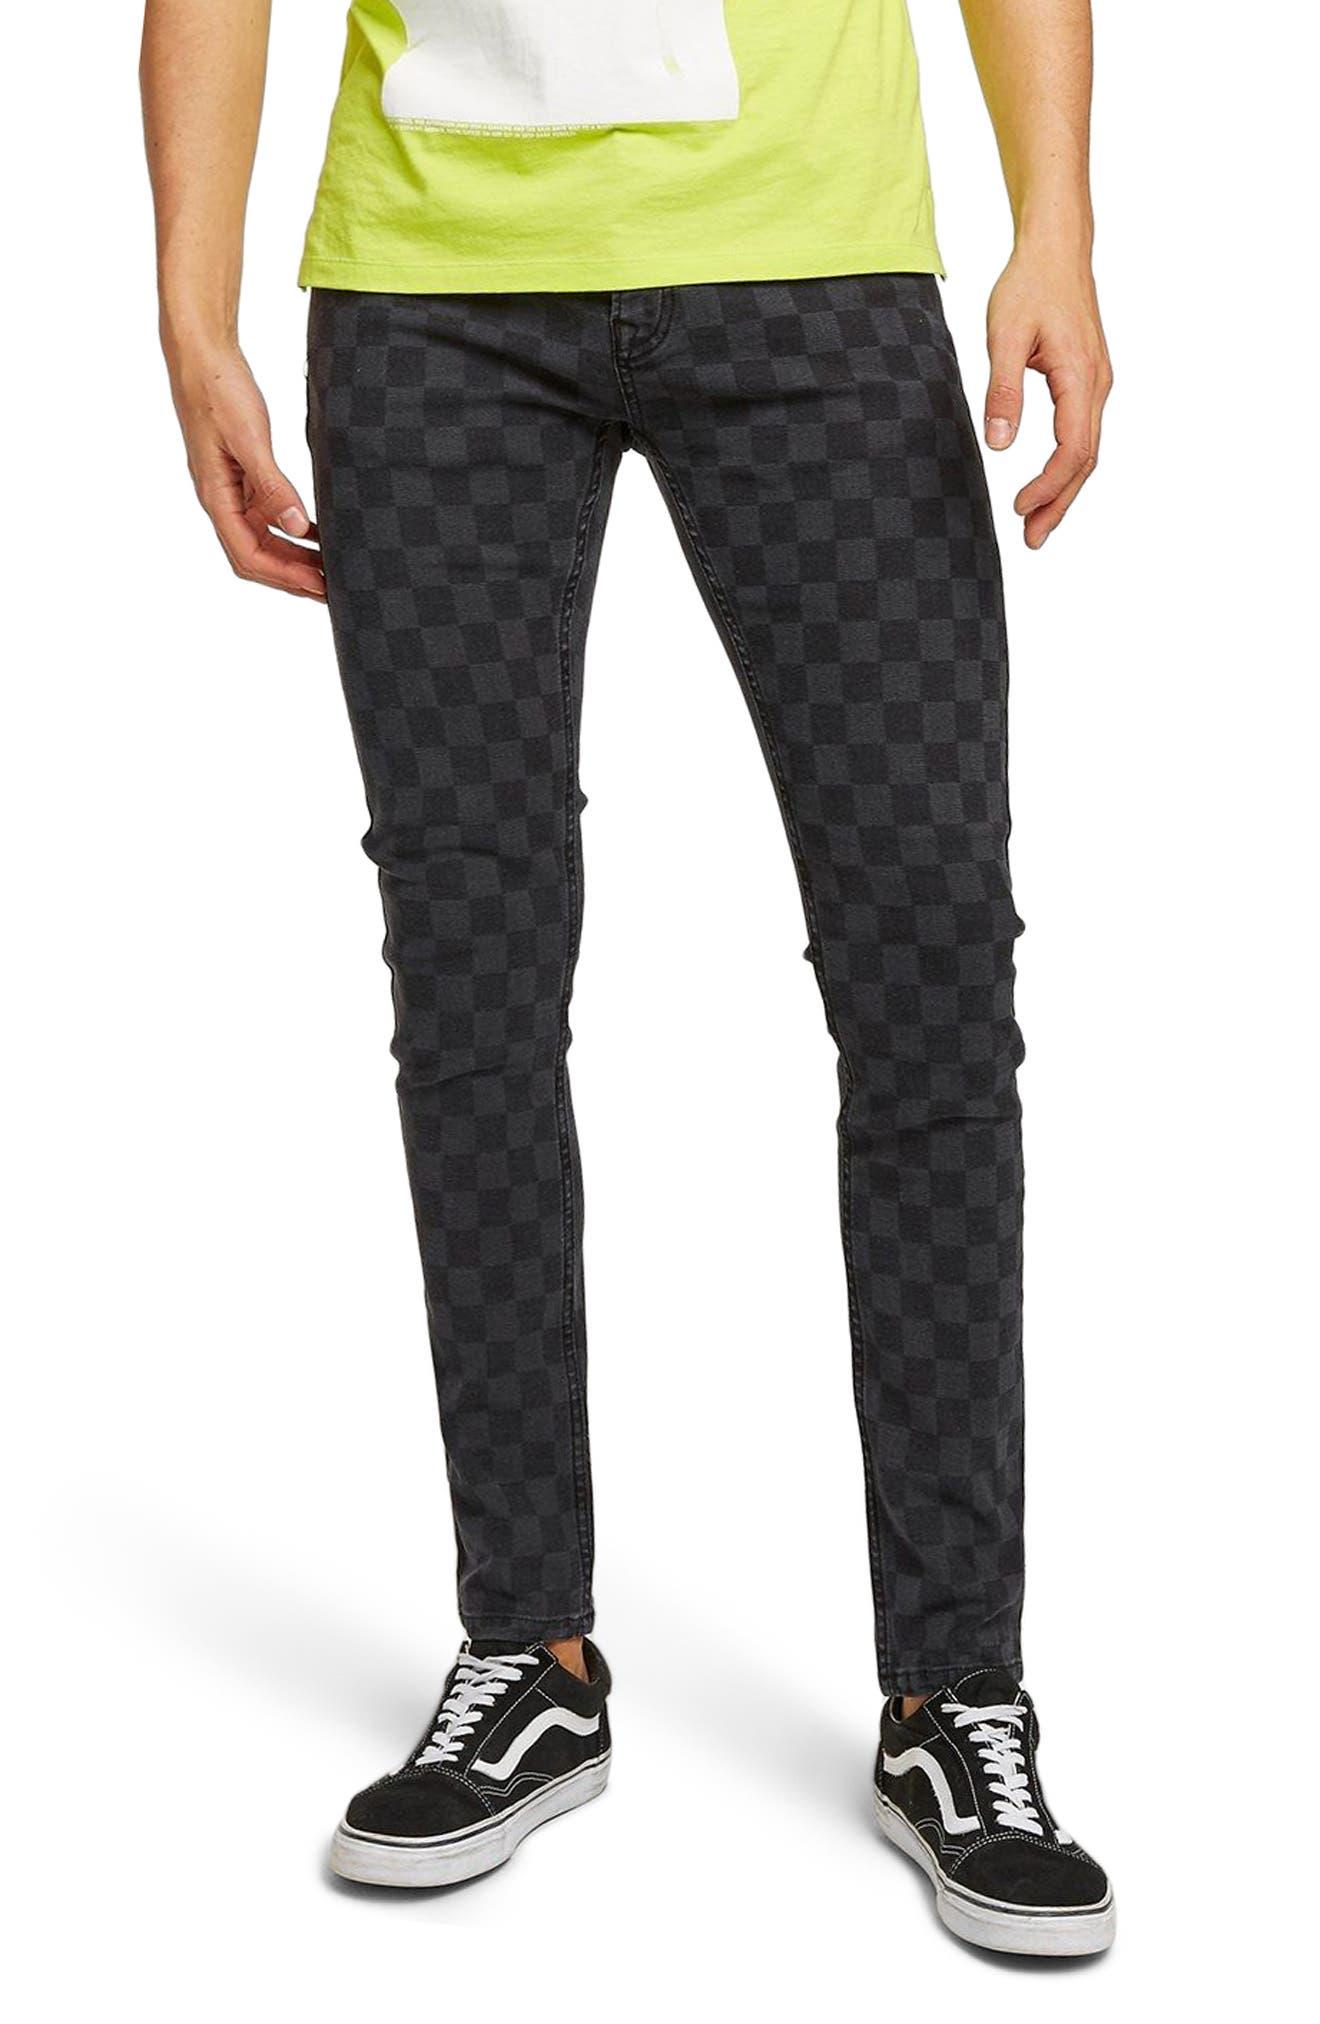 Check Stretch Skinny Fit Pants,                             Main thumbnail 1, color,                             Black Multi